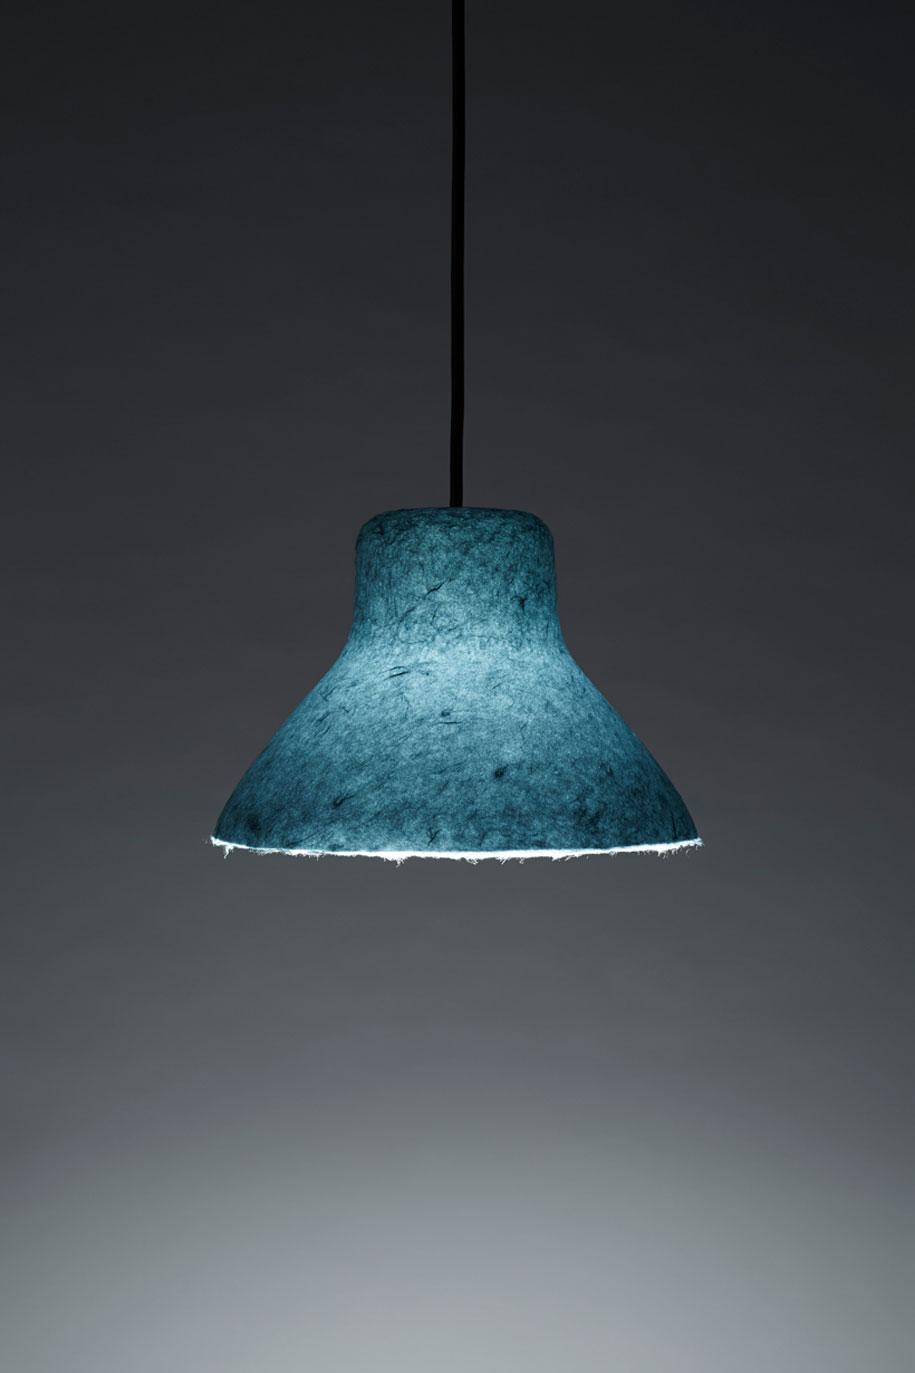 Nendo-Lamp-Akihiro-Yoshida-Habitus-Living-05